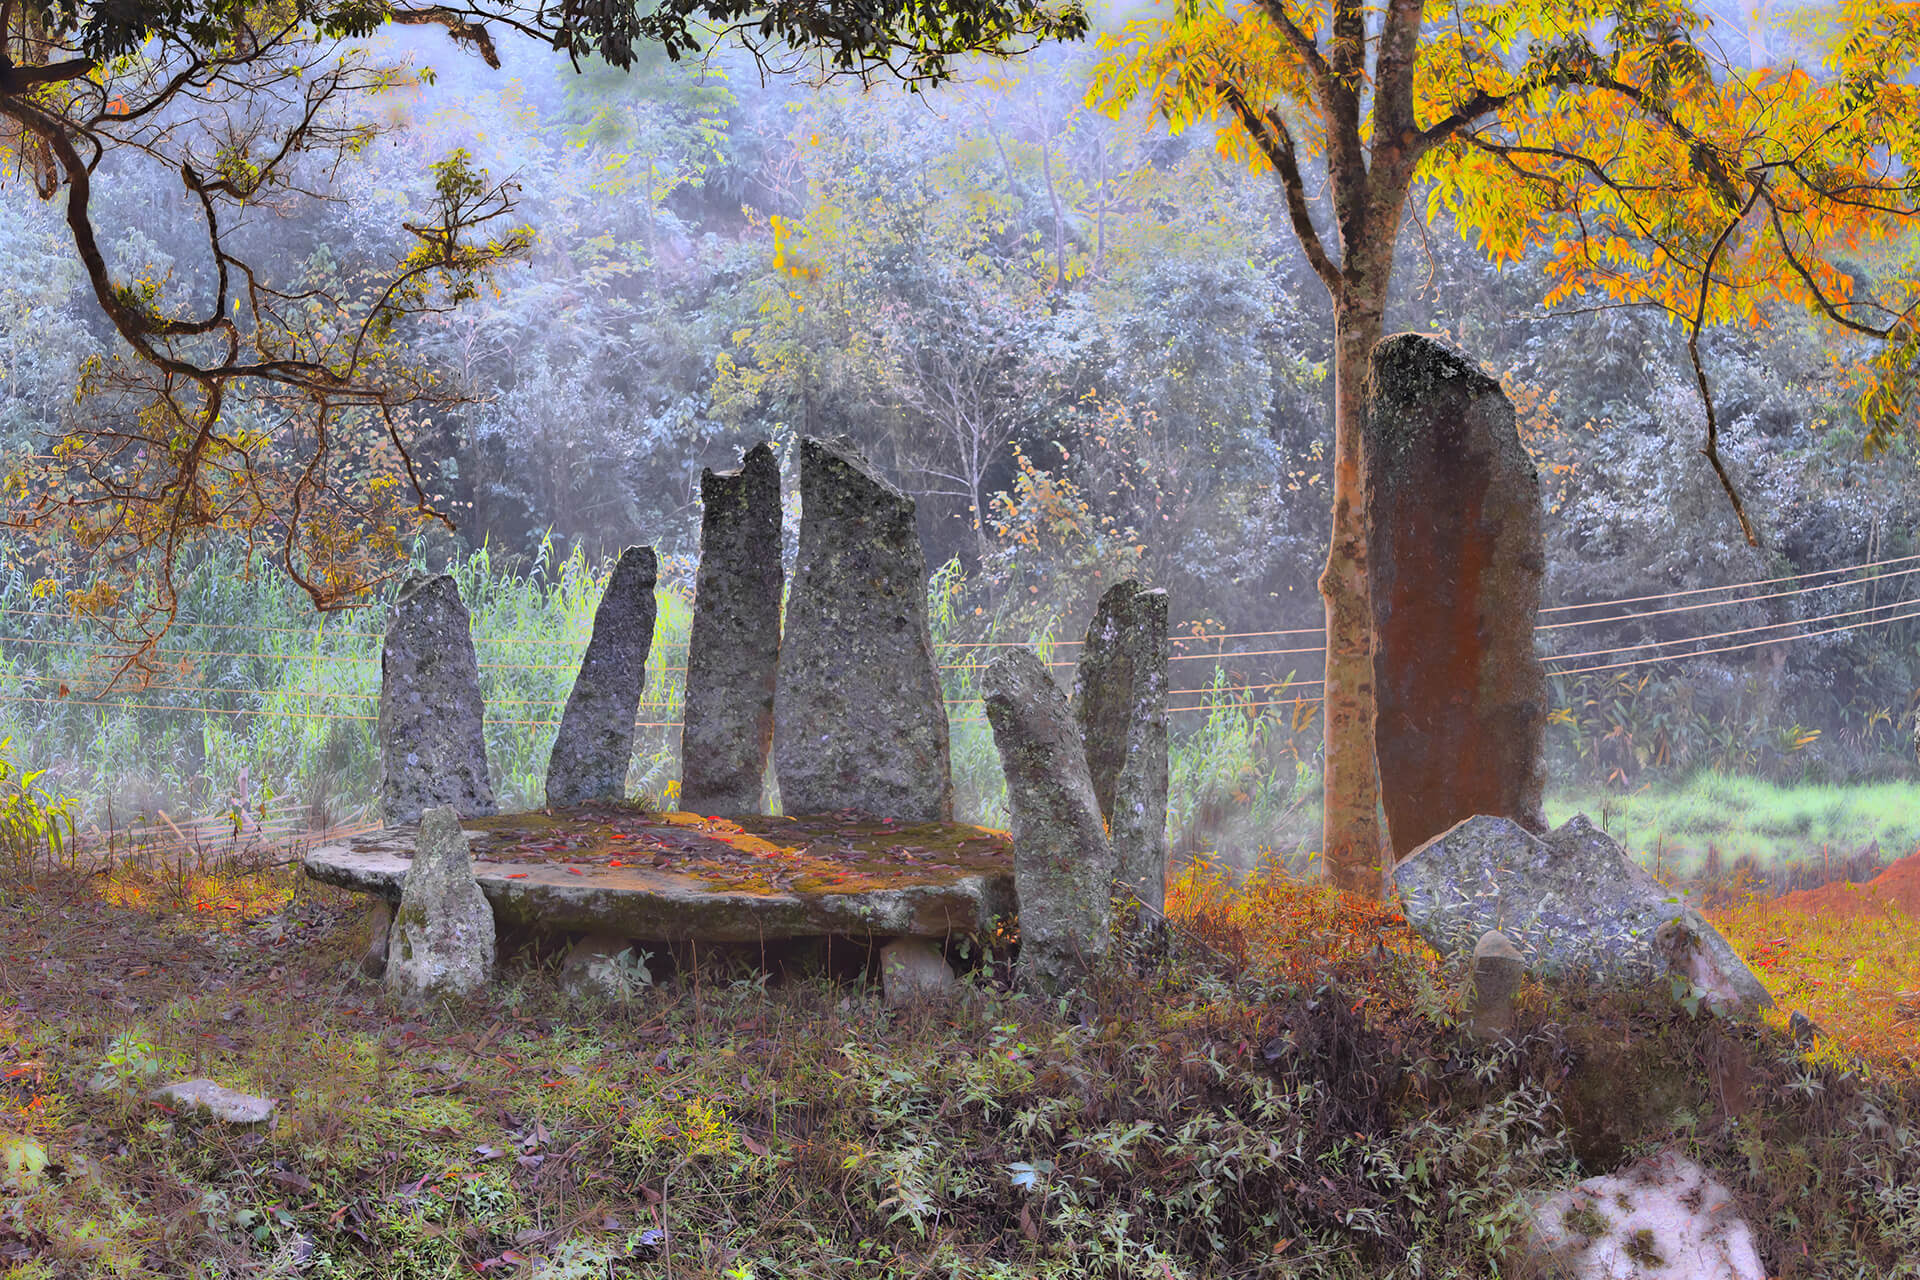 Nartiang Monoliths